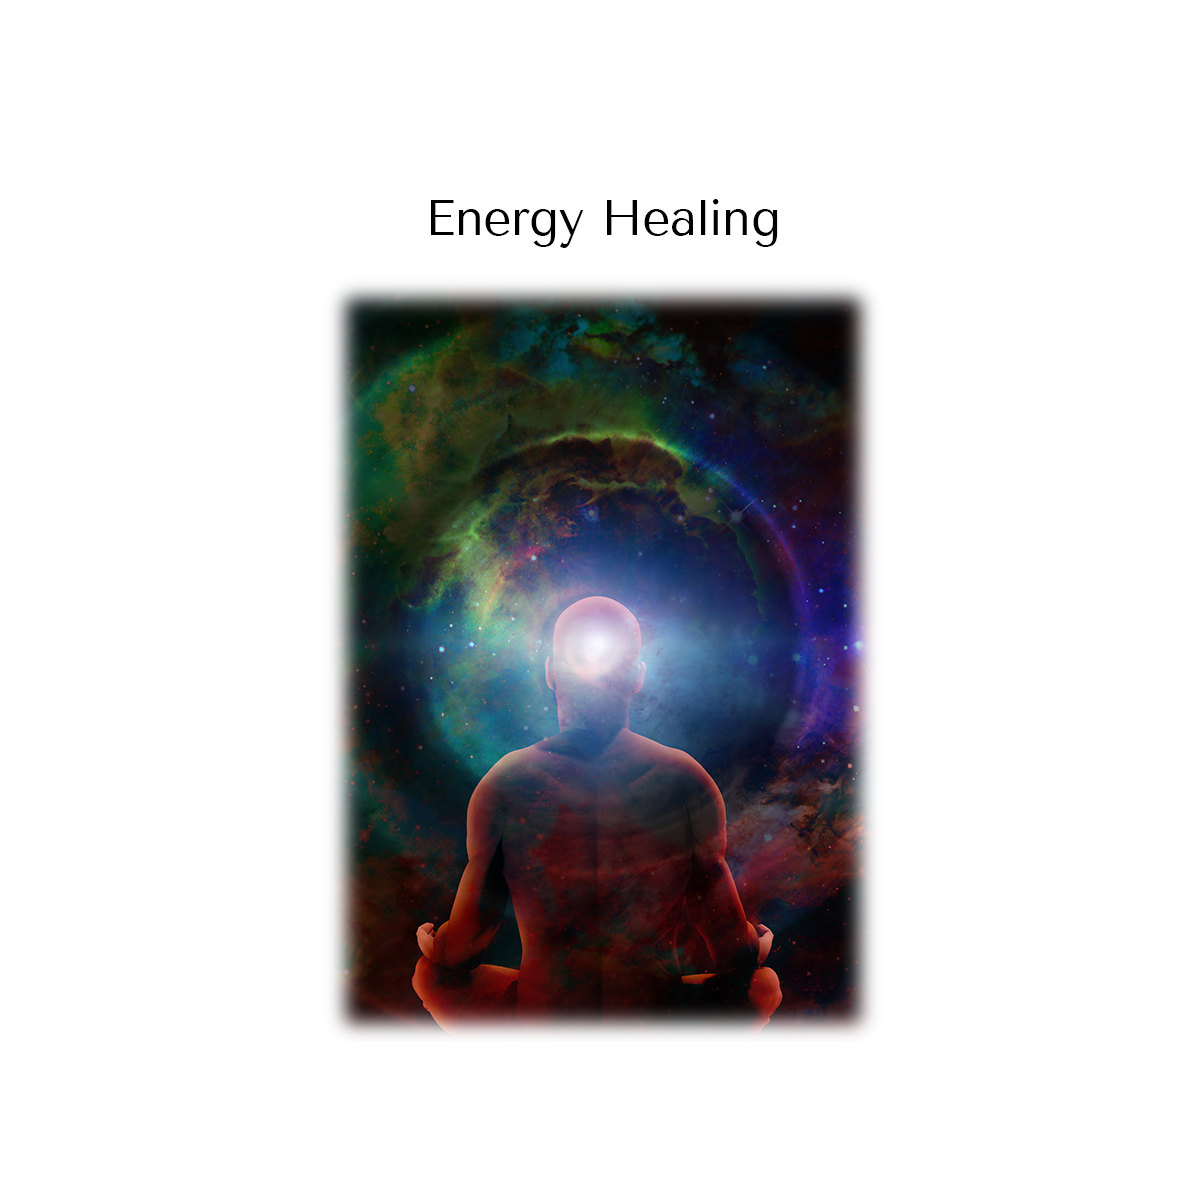 https://www.robertperryhealing.com/wp-content/uploads/2021/05/Produst-image-Energy-Healing-2.0.png